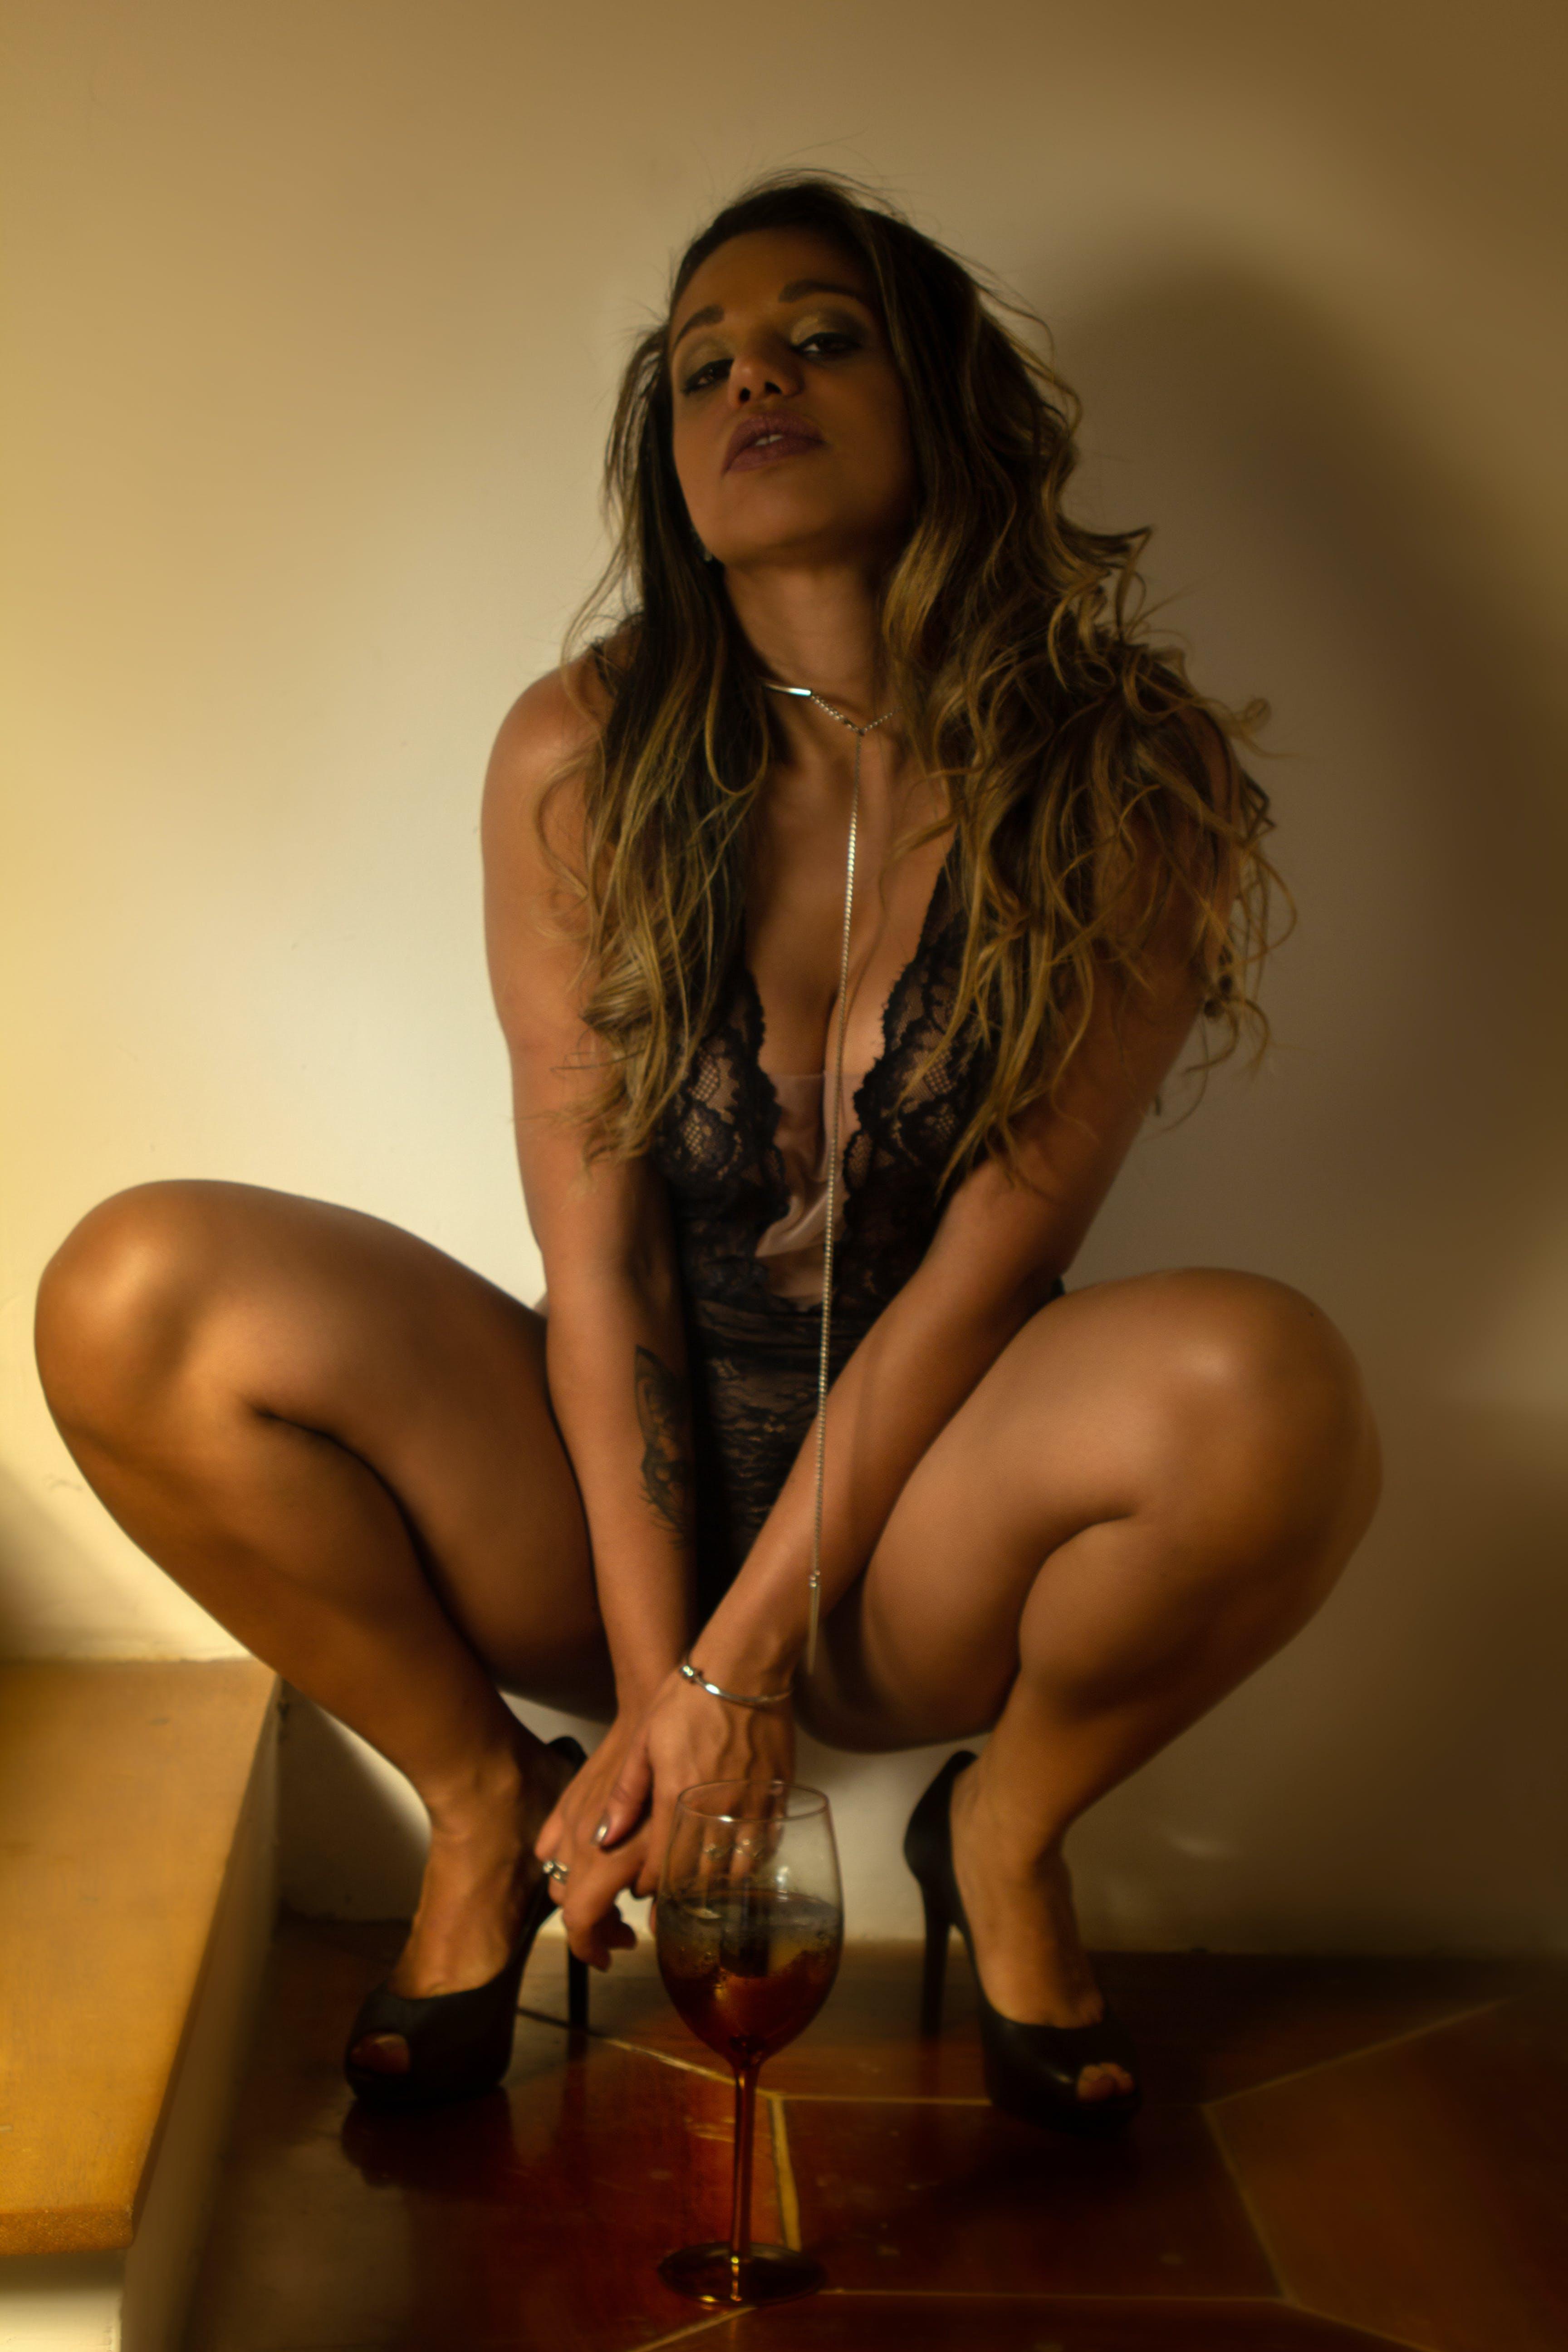 Gratis stockfoto met sensualiteit, sensueel